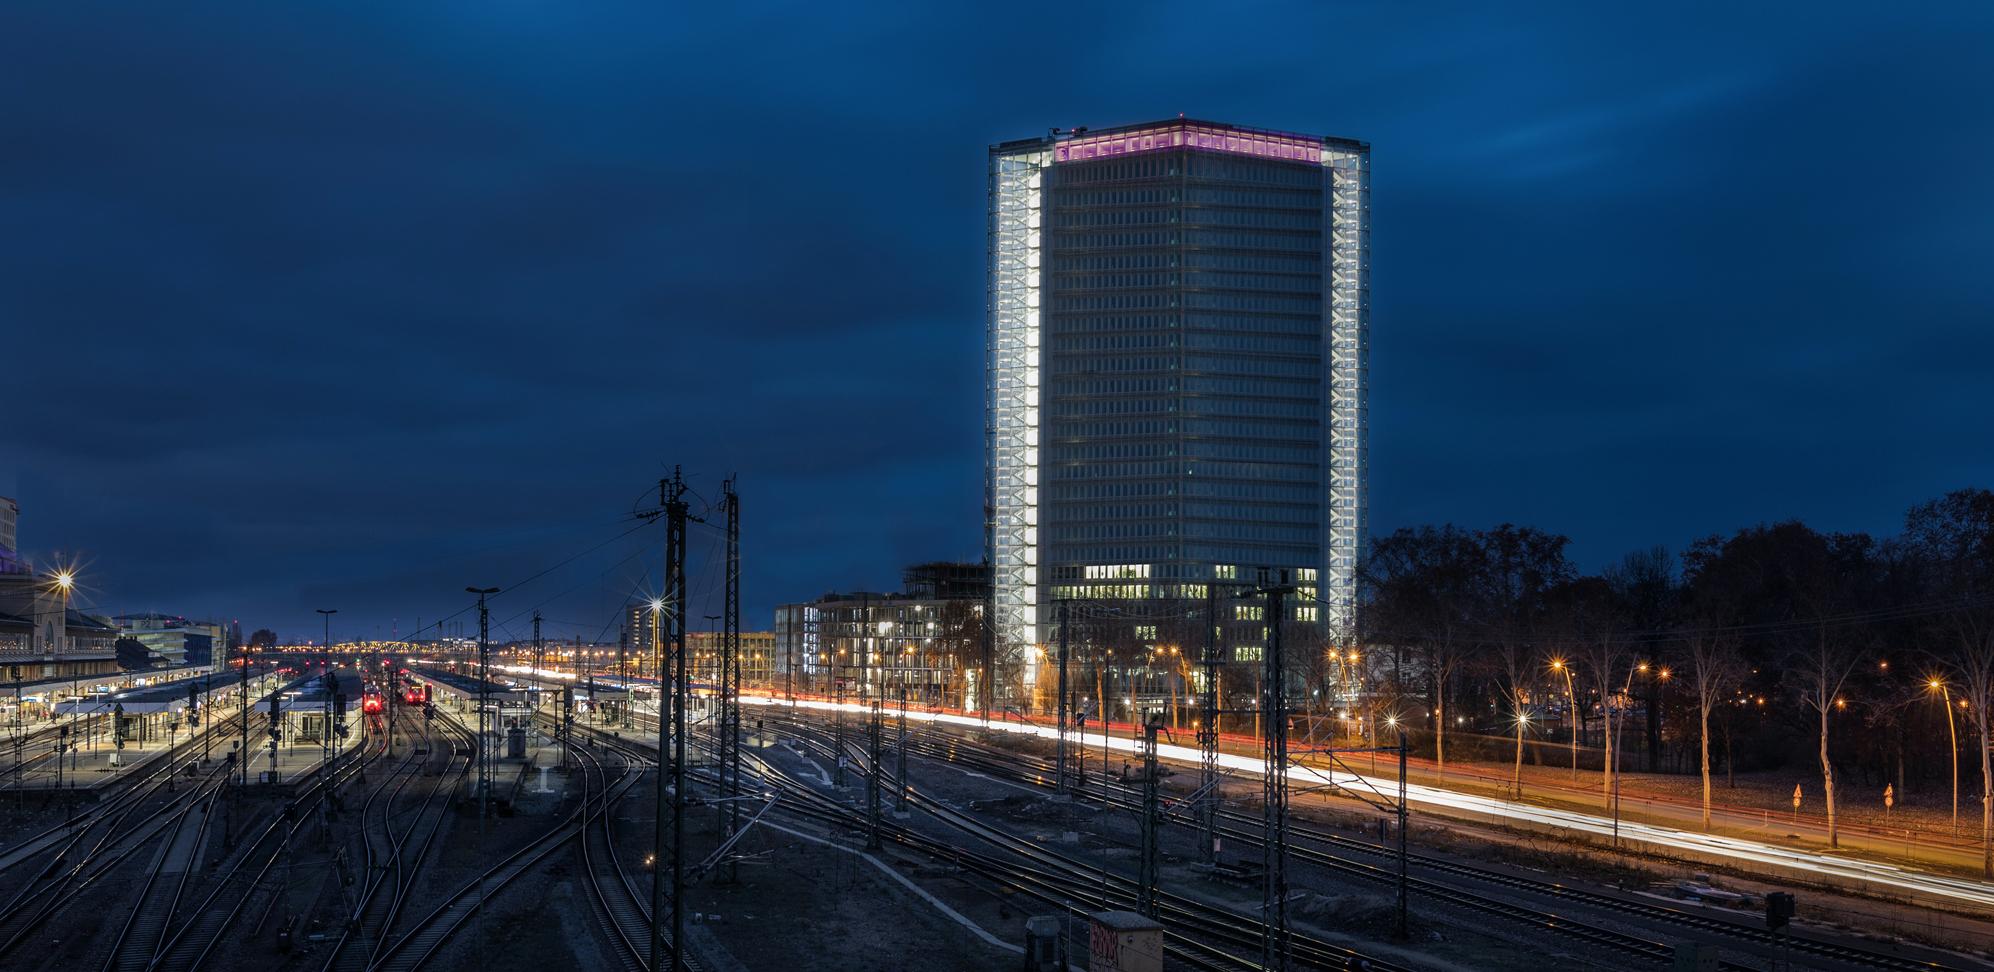 Victoria-Turm Mannheim